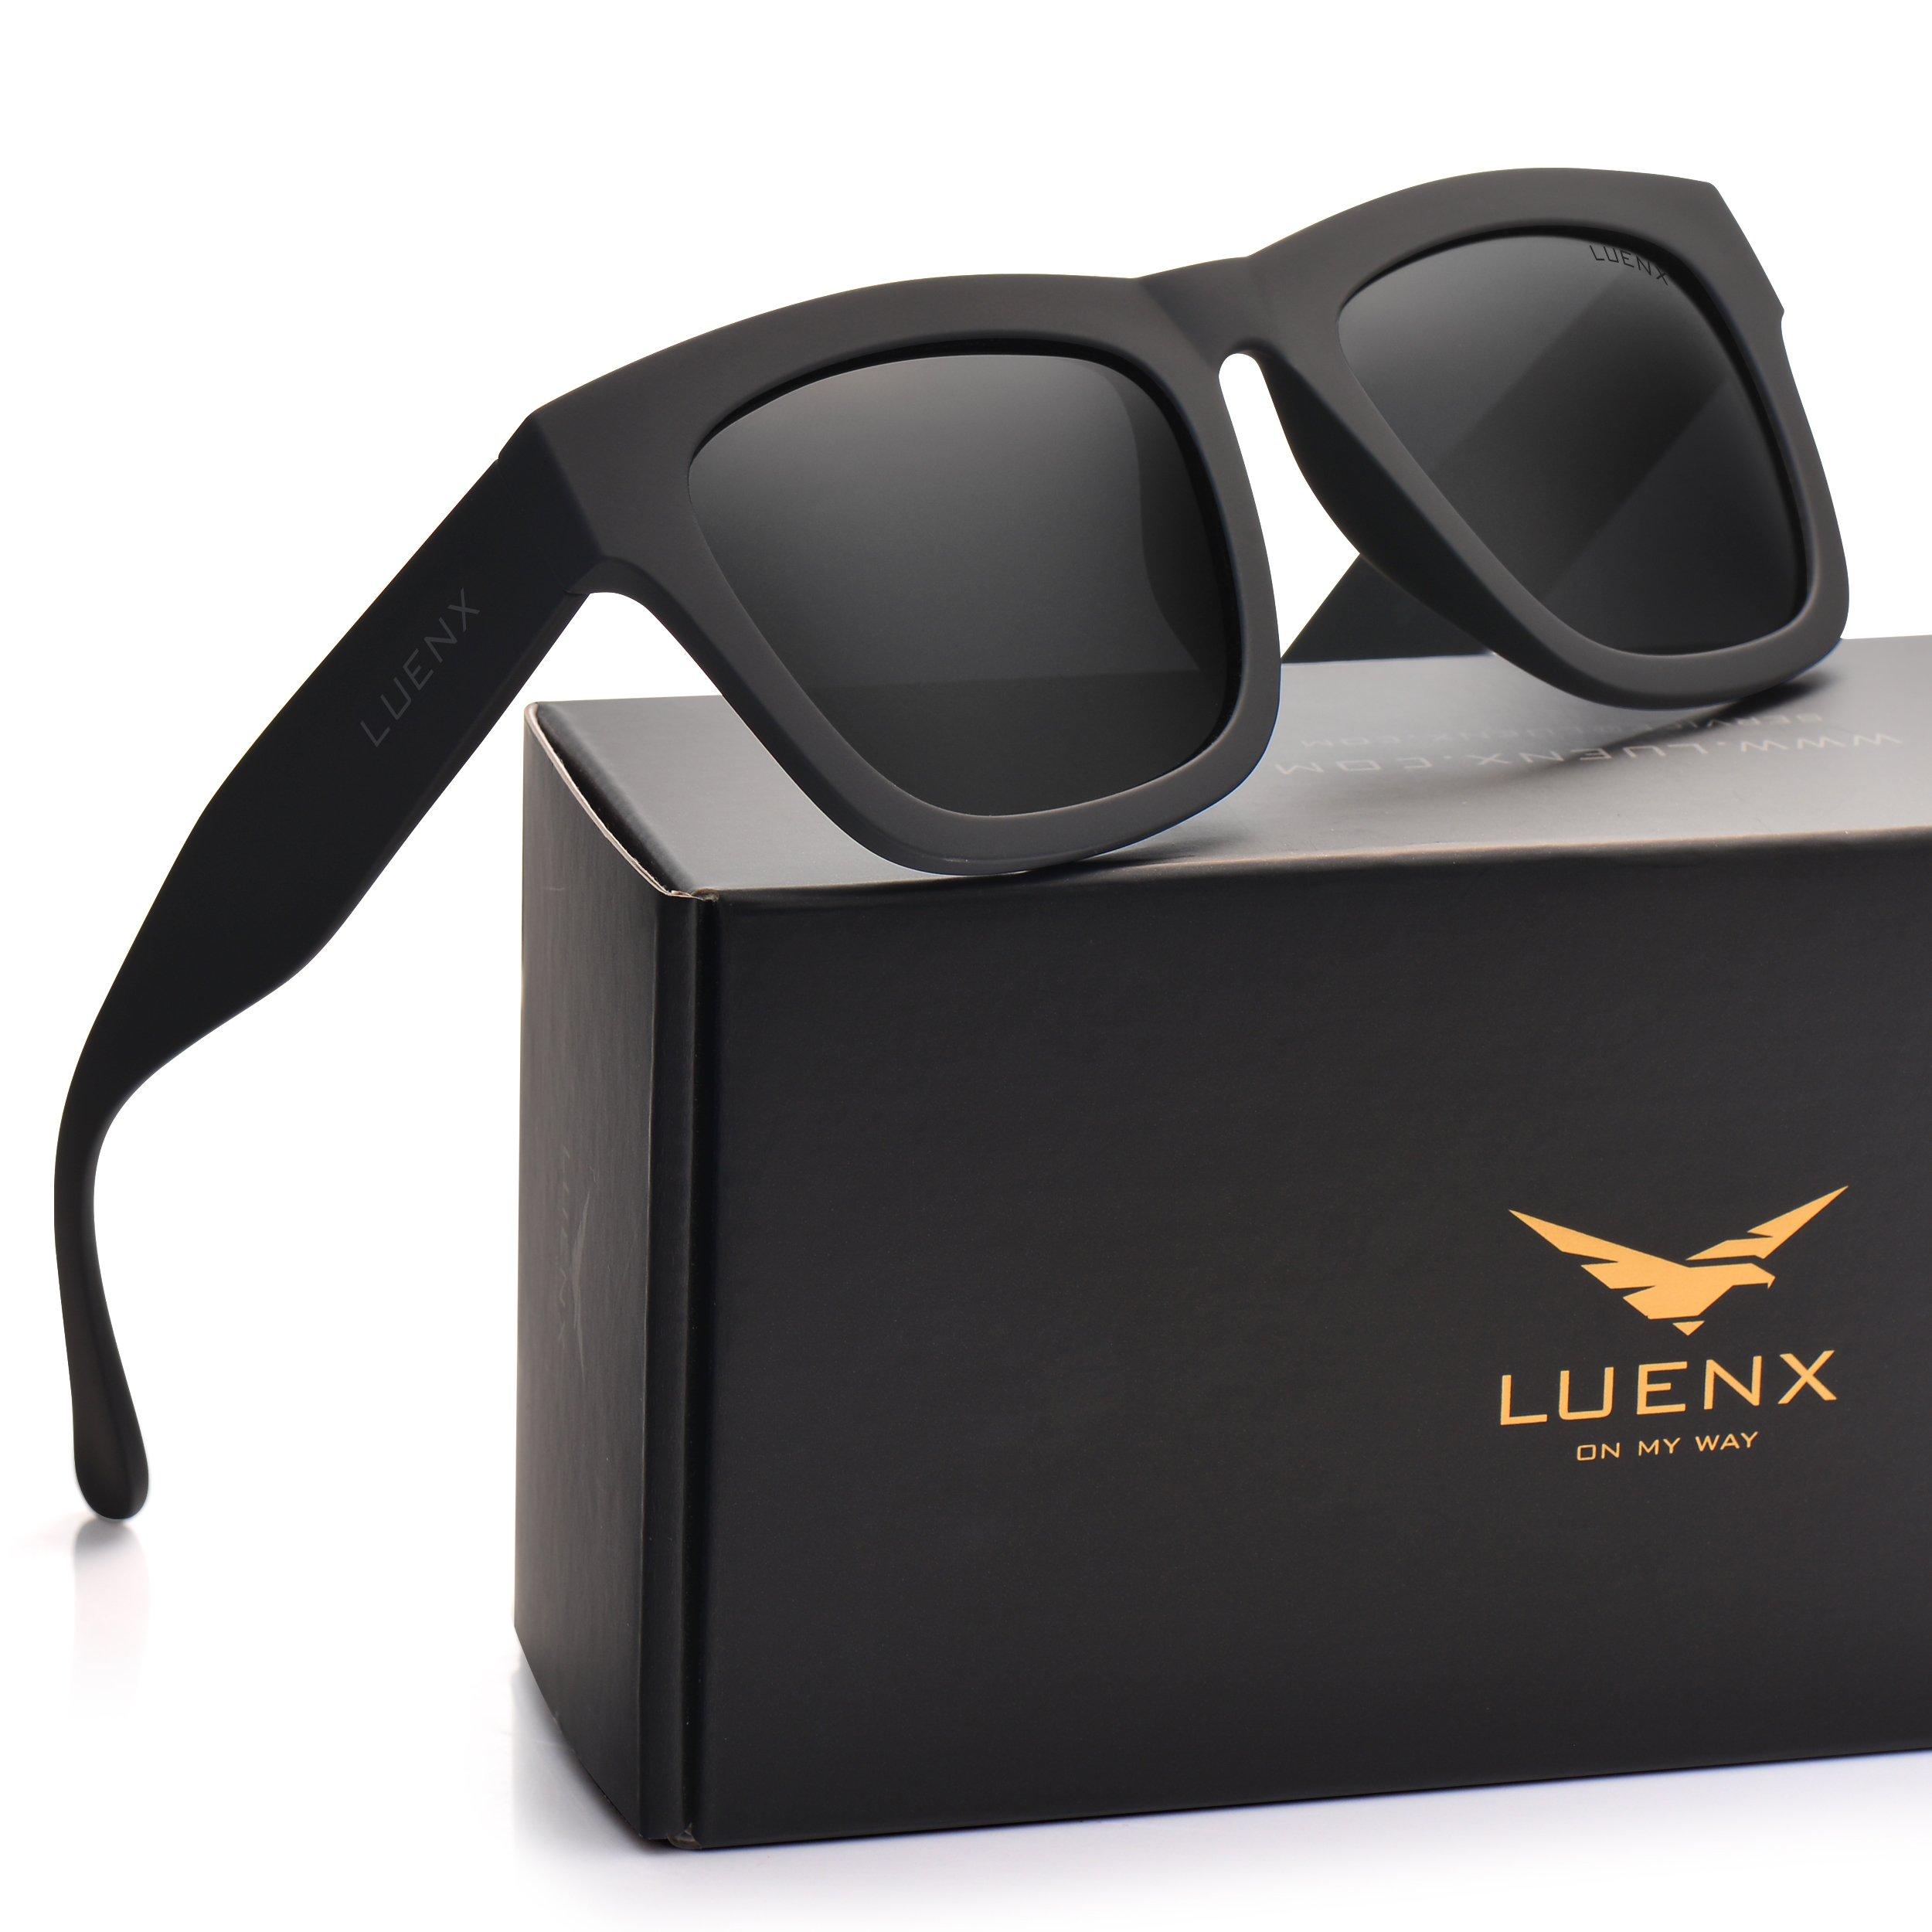 LUENX Mens Wayfarer Polarized Sunglasses Classic UV 400 Protection Black Lens Matte Black Frame 58MM with Case